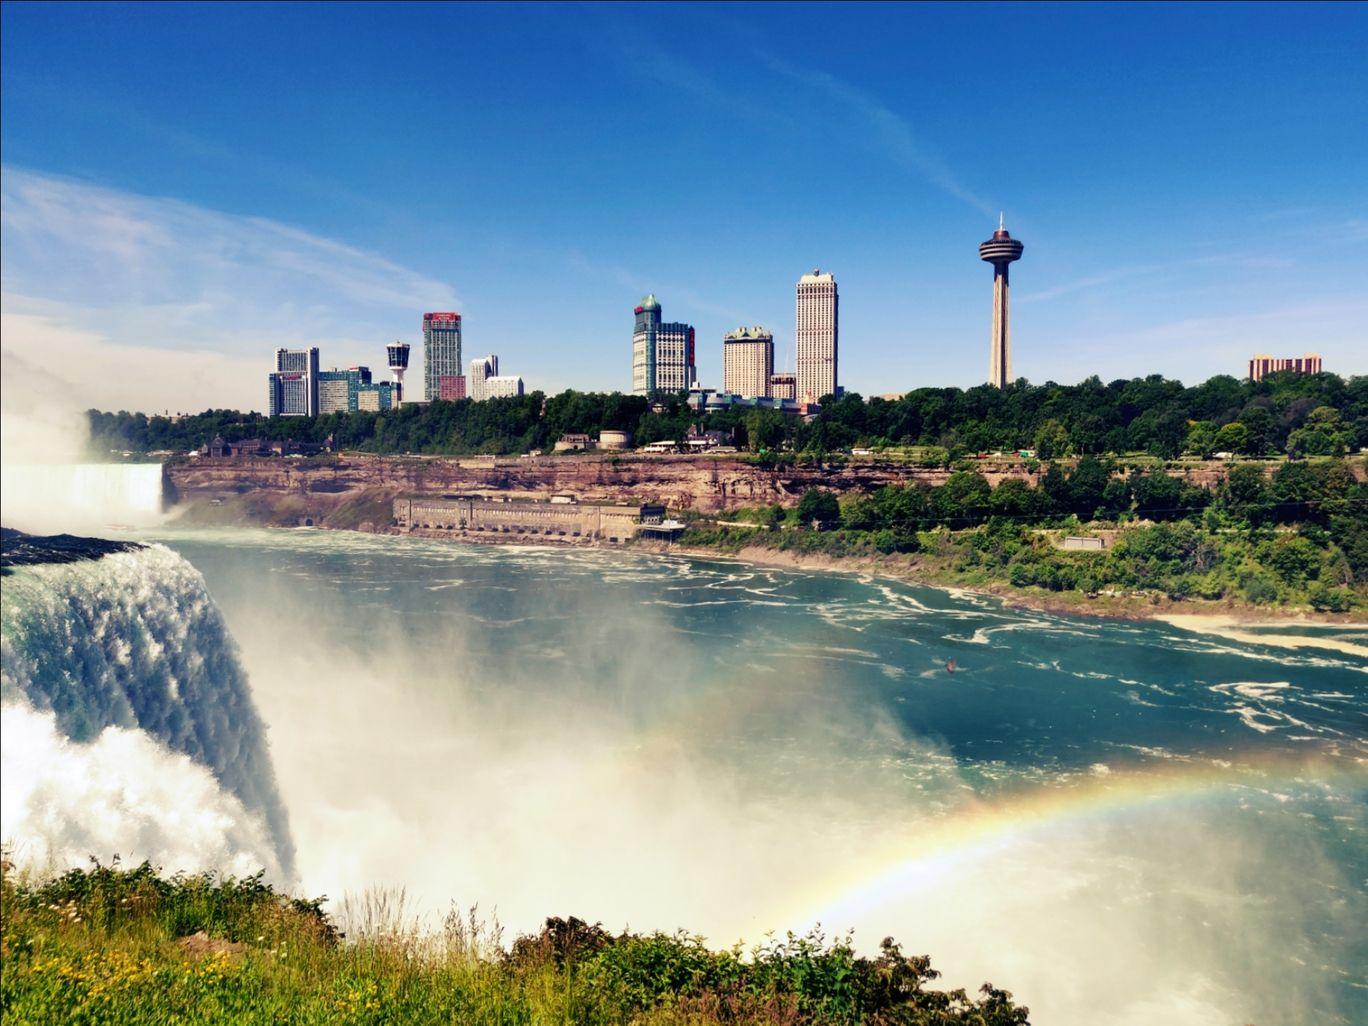 Photo of Niagara Falls By sonam tayde